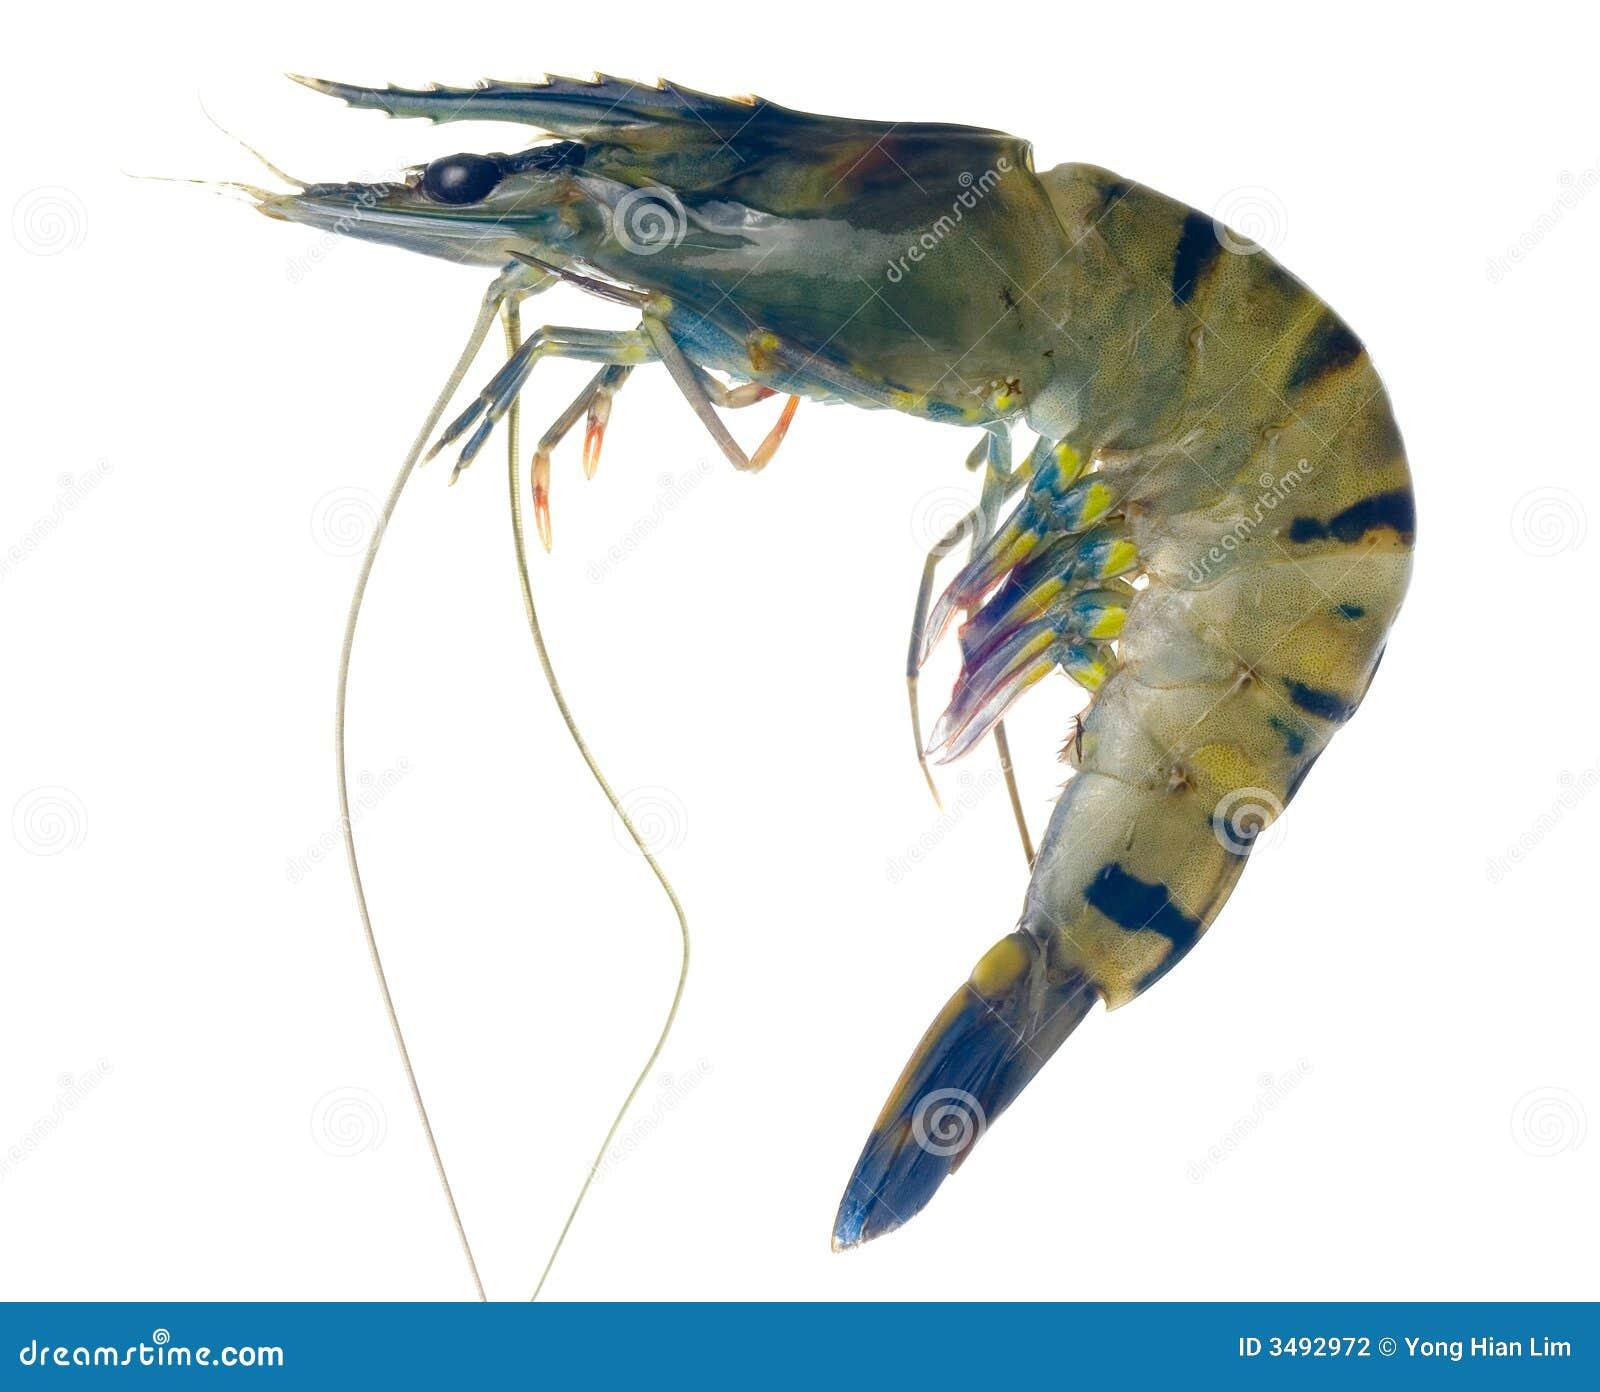 Raw black tiger prawn stock photo. Image of tasty ...